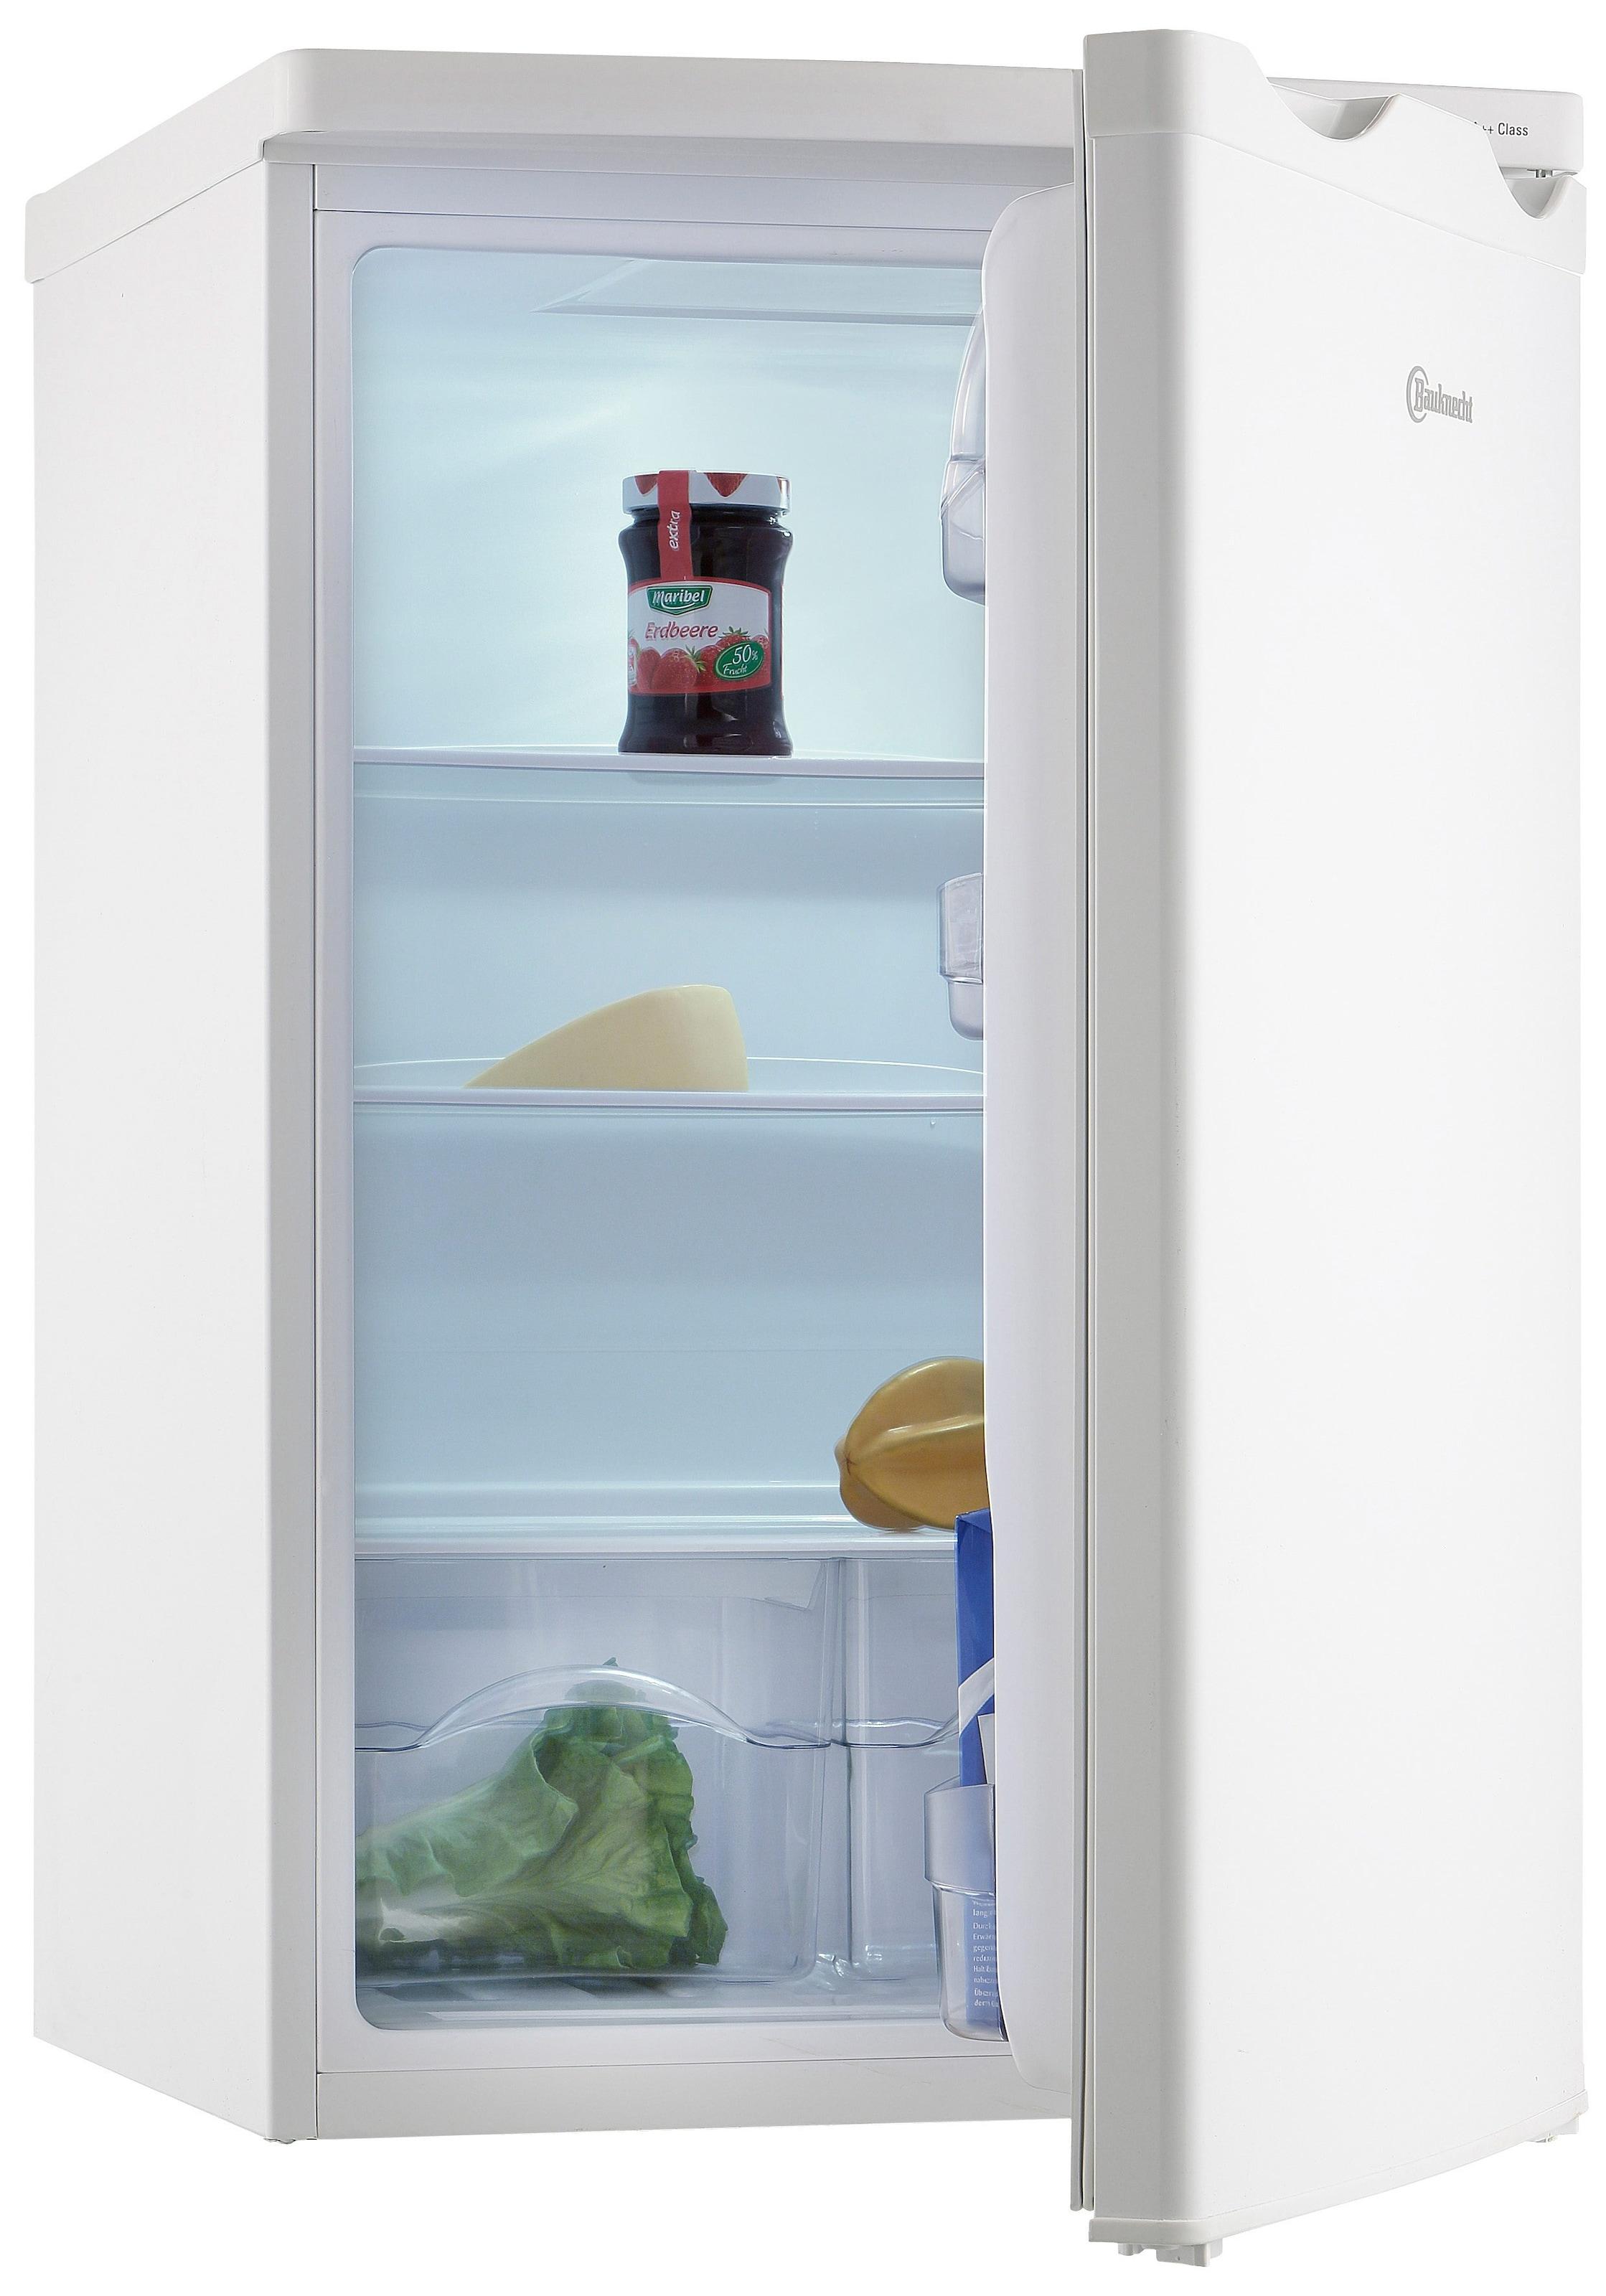 Retro Kühlschrank 85 Cm : Bauknecht kühlschrank cm hoch cm breit per raten baur